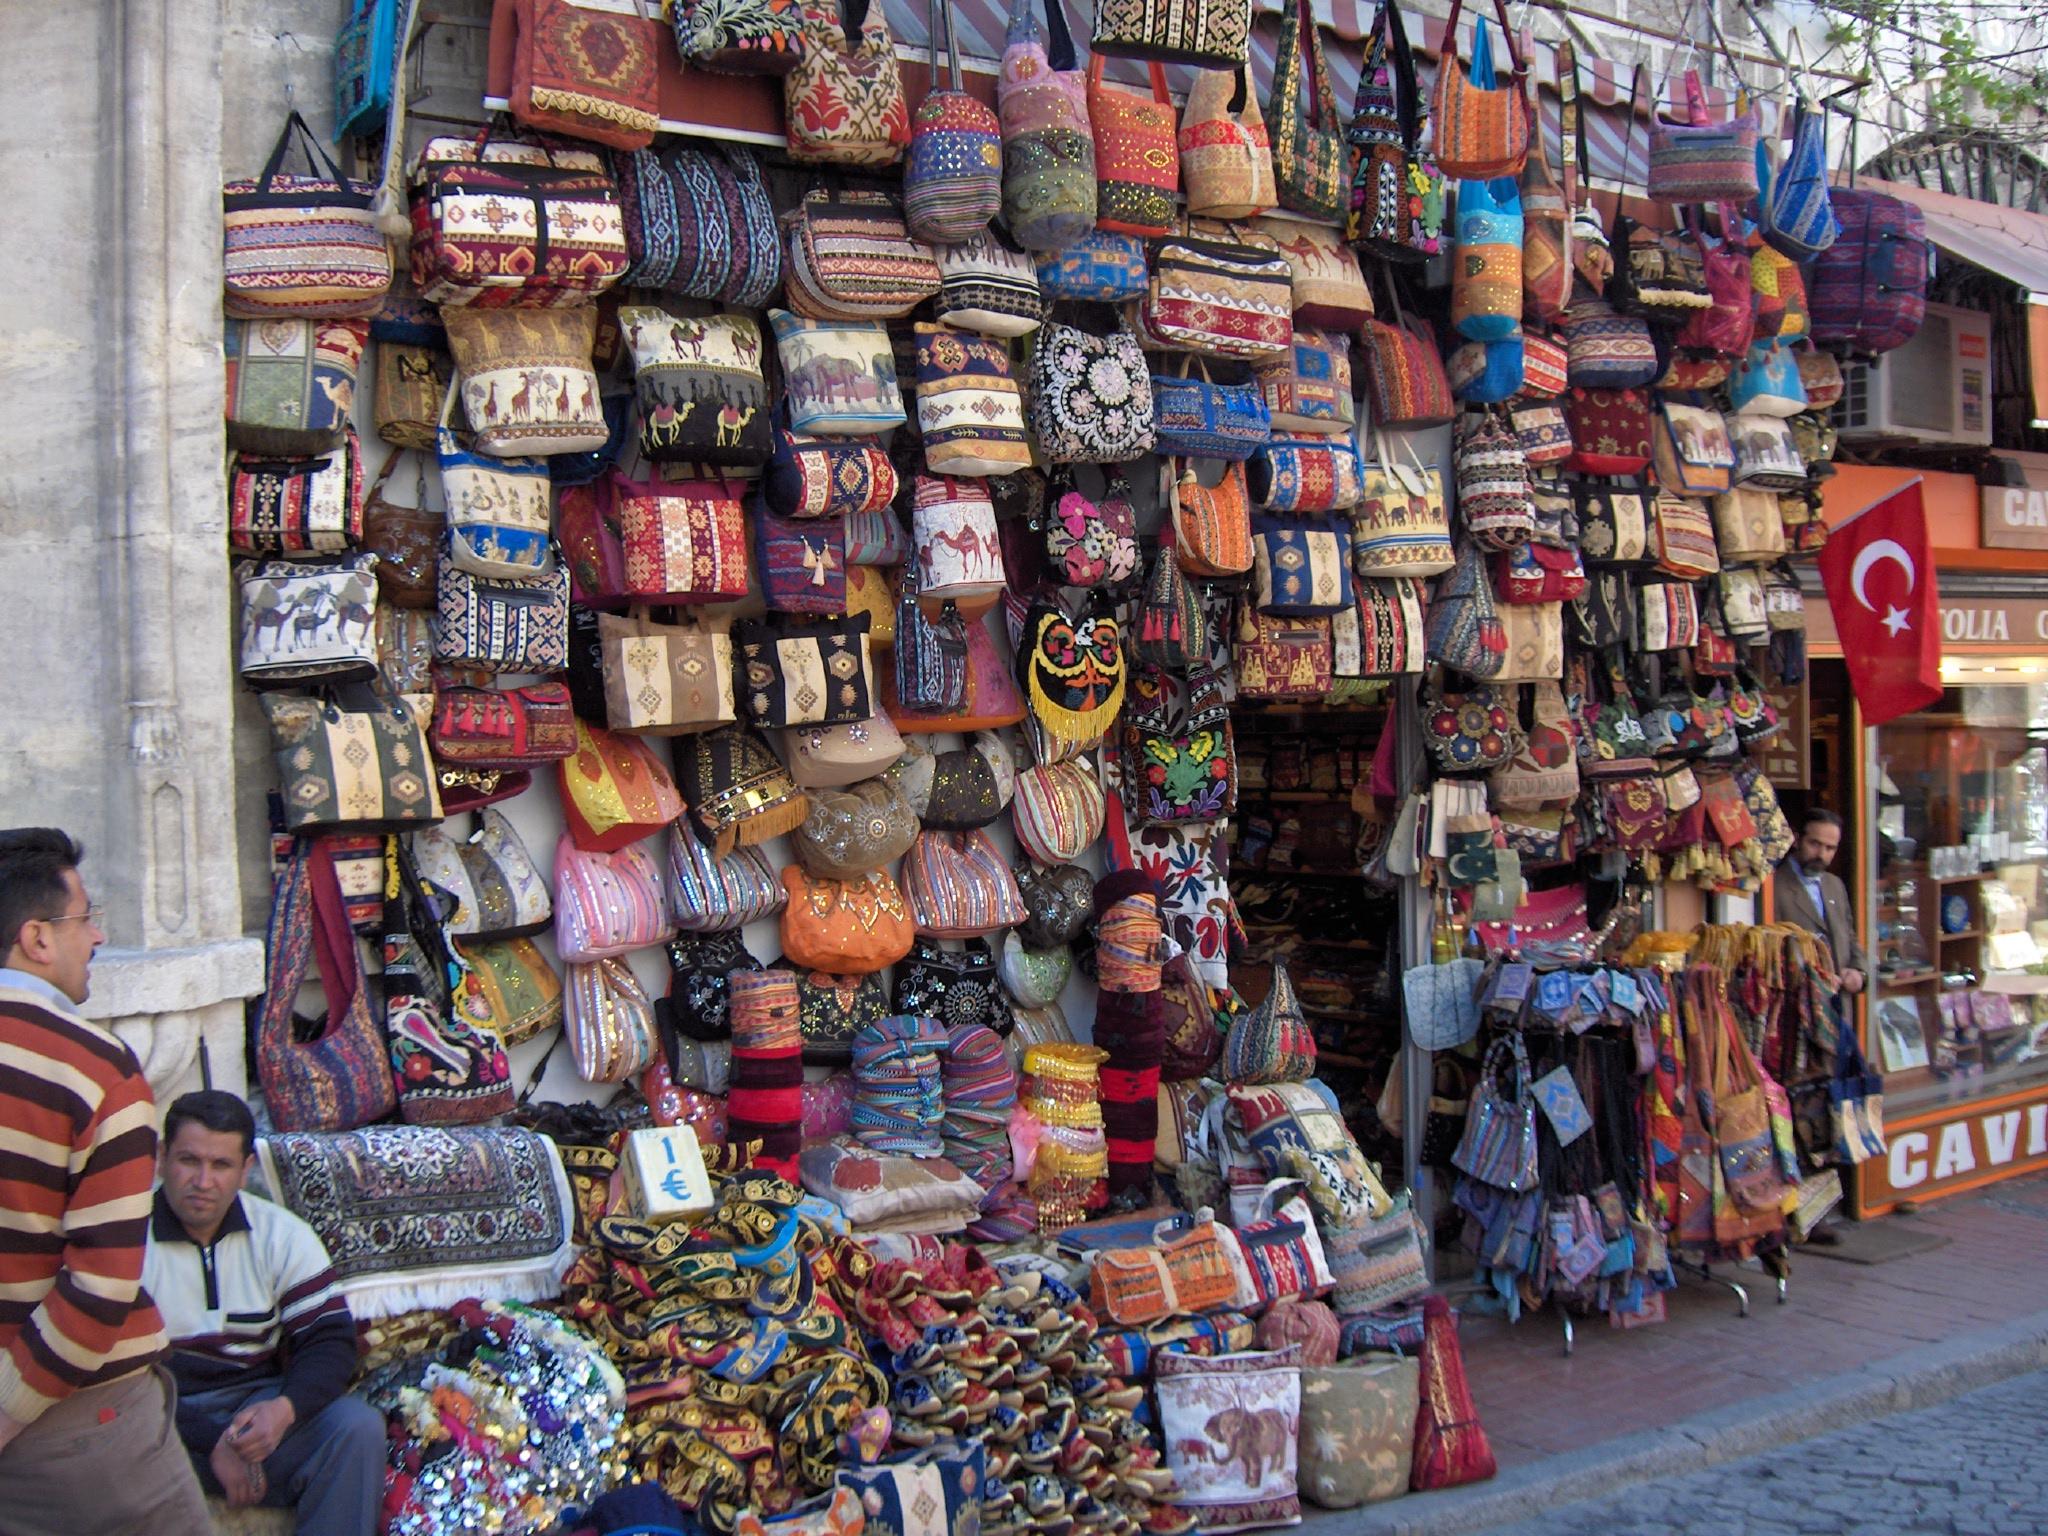 Shopping galore at Istanbul's Grand Bazaar (PHOTOS ...